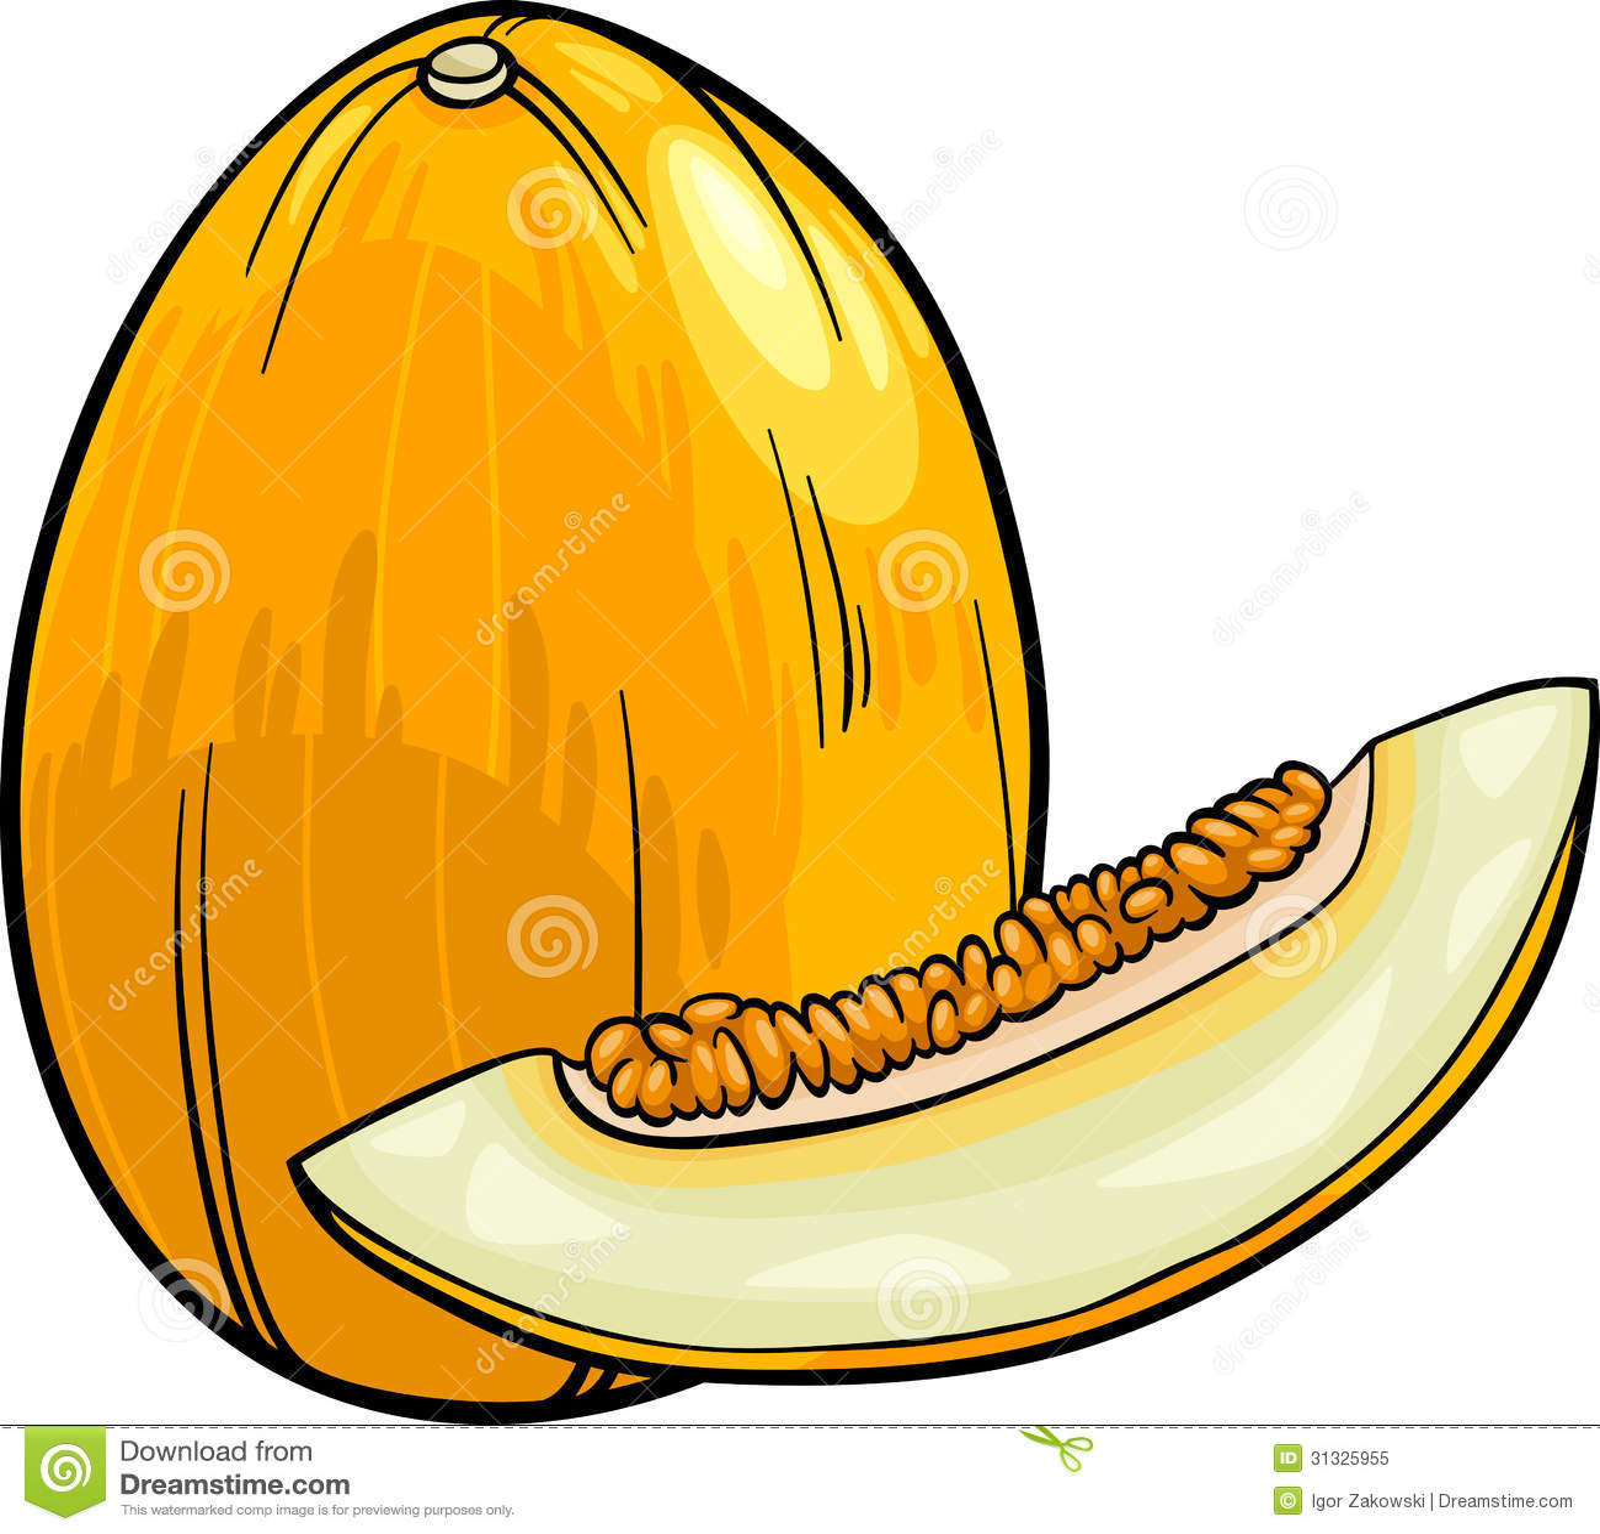 Melon Fruit Cartoon Illustration Royalty Free Stock Photo Image